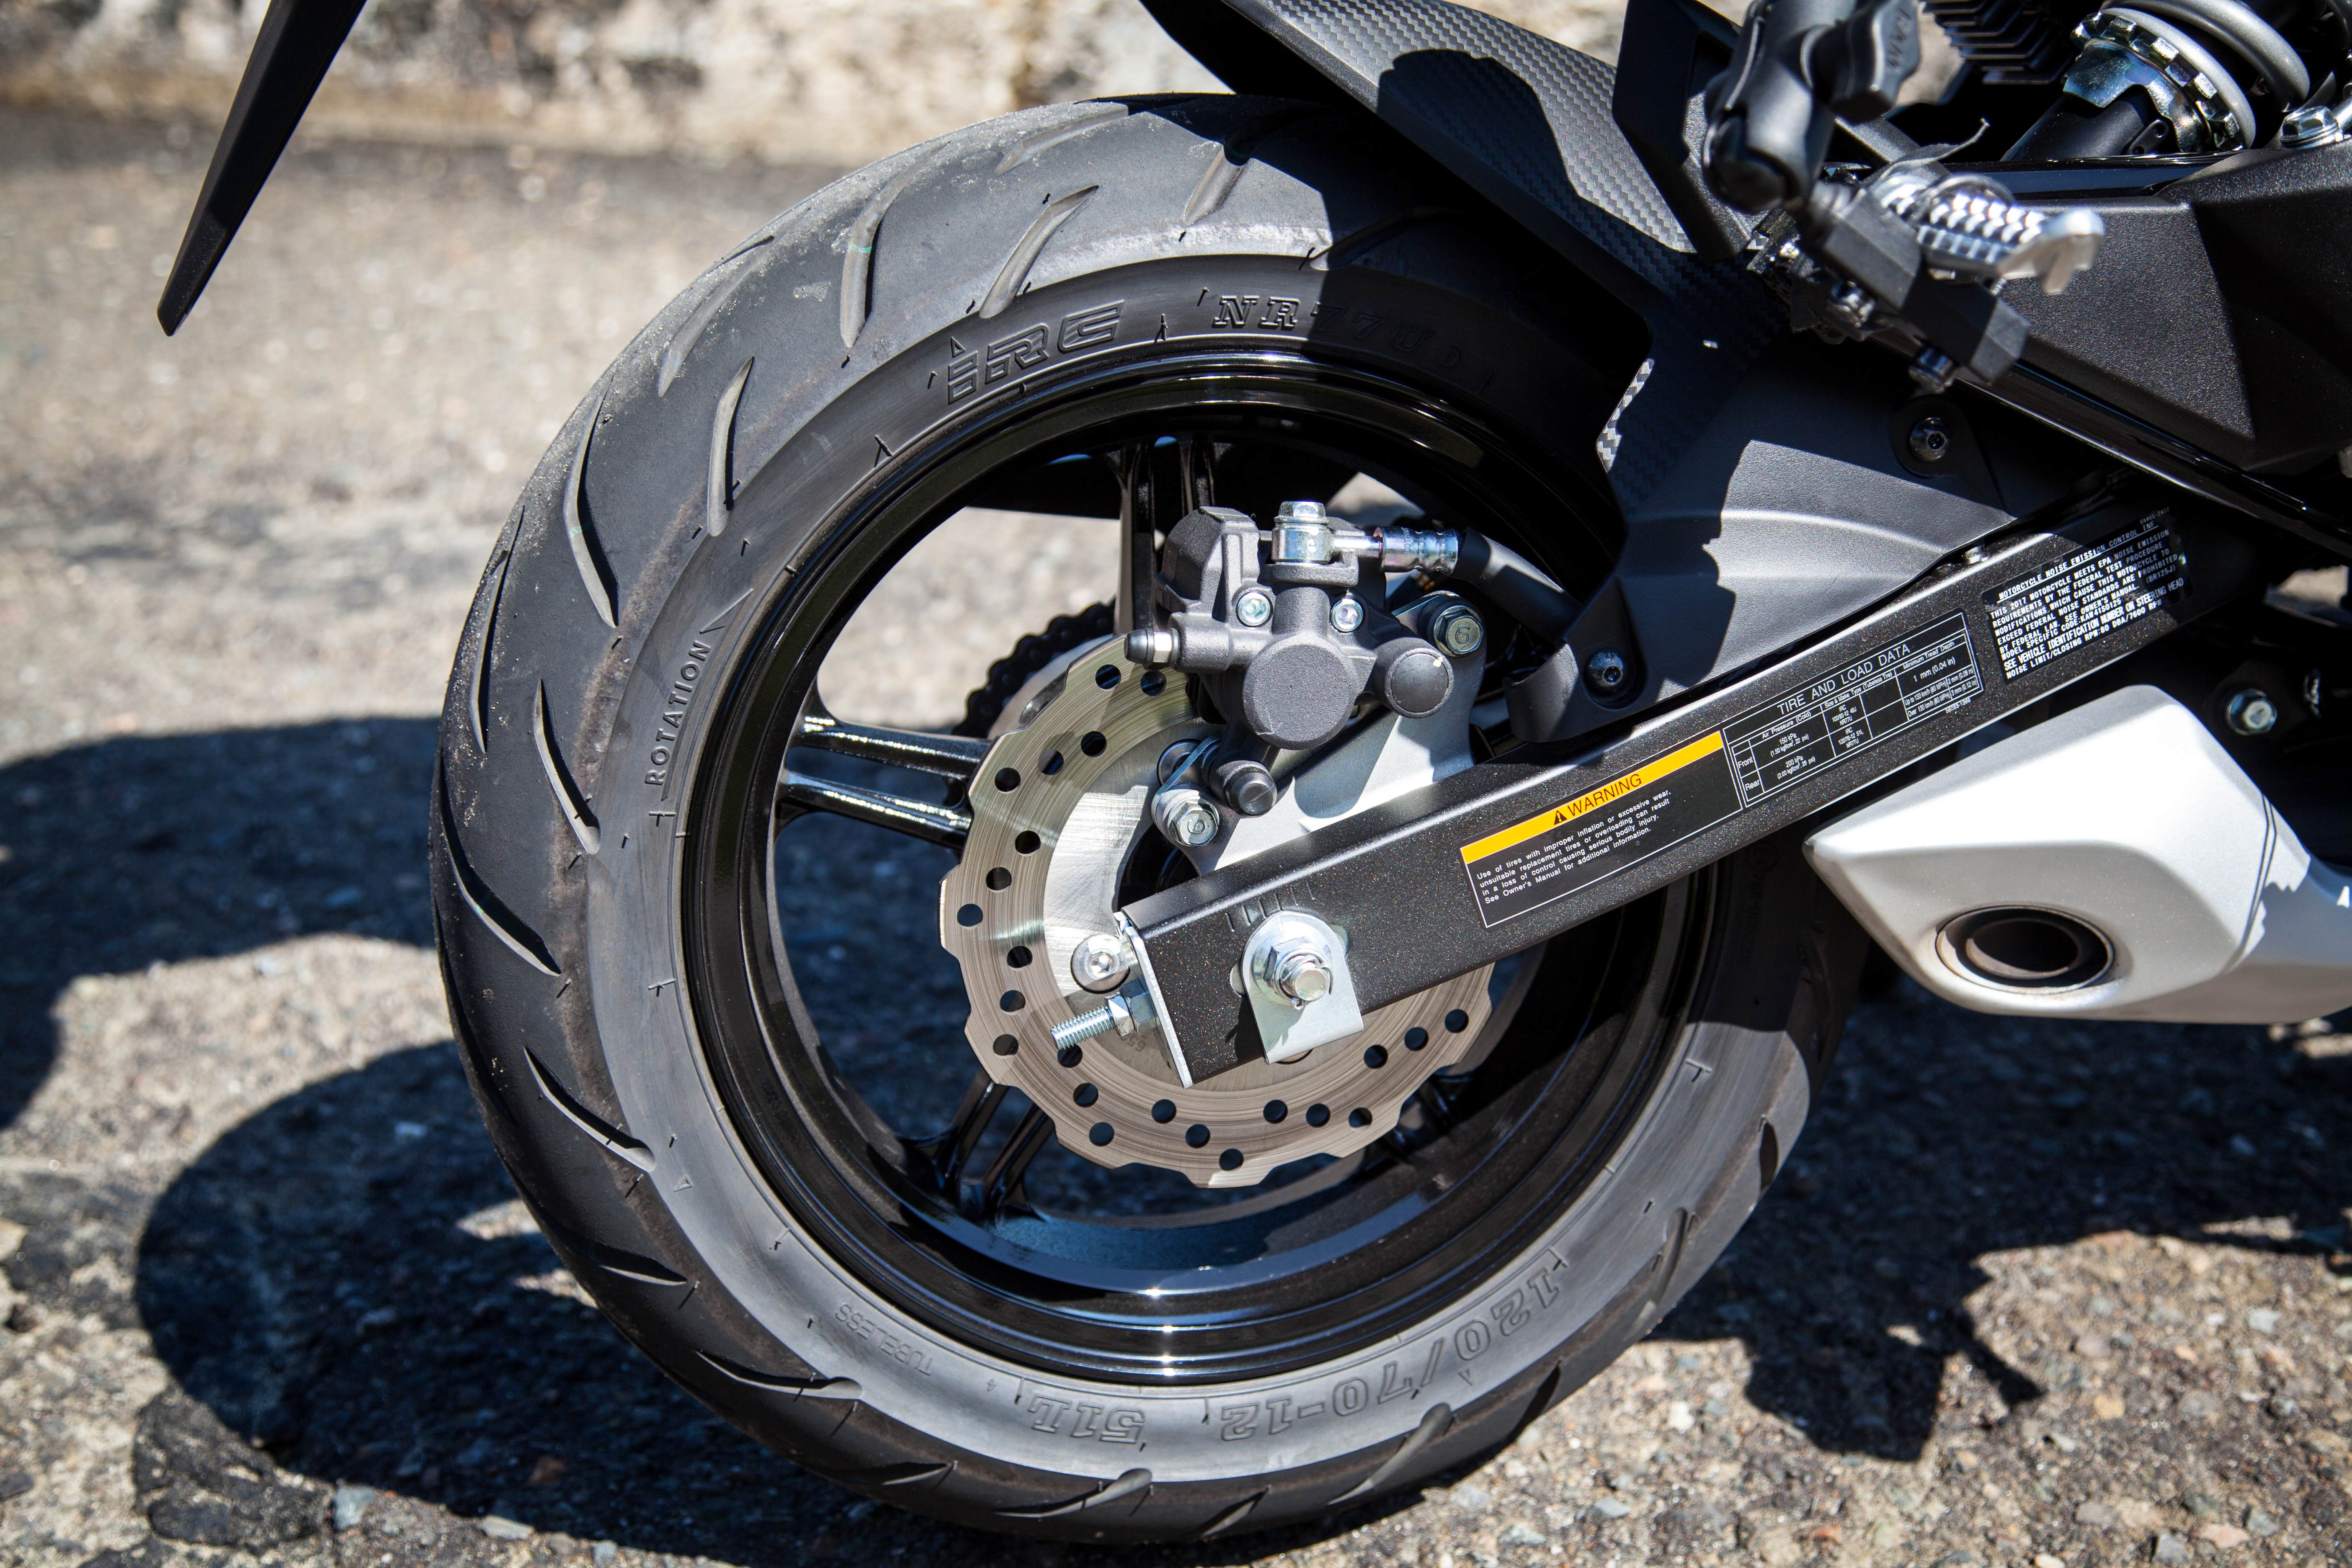 2017 Kawasaki Z125 Pro first ride review - RevZilla